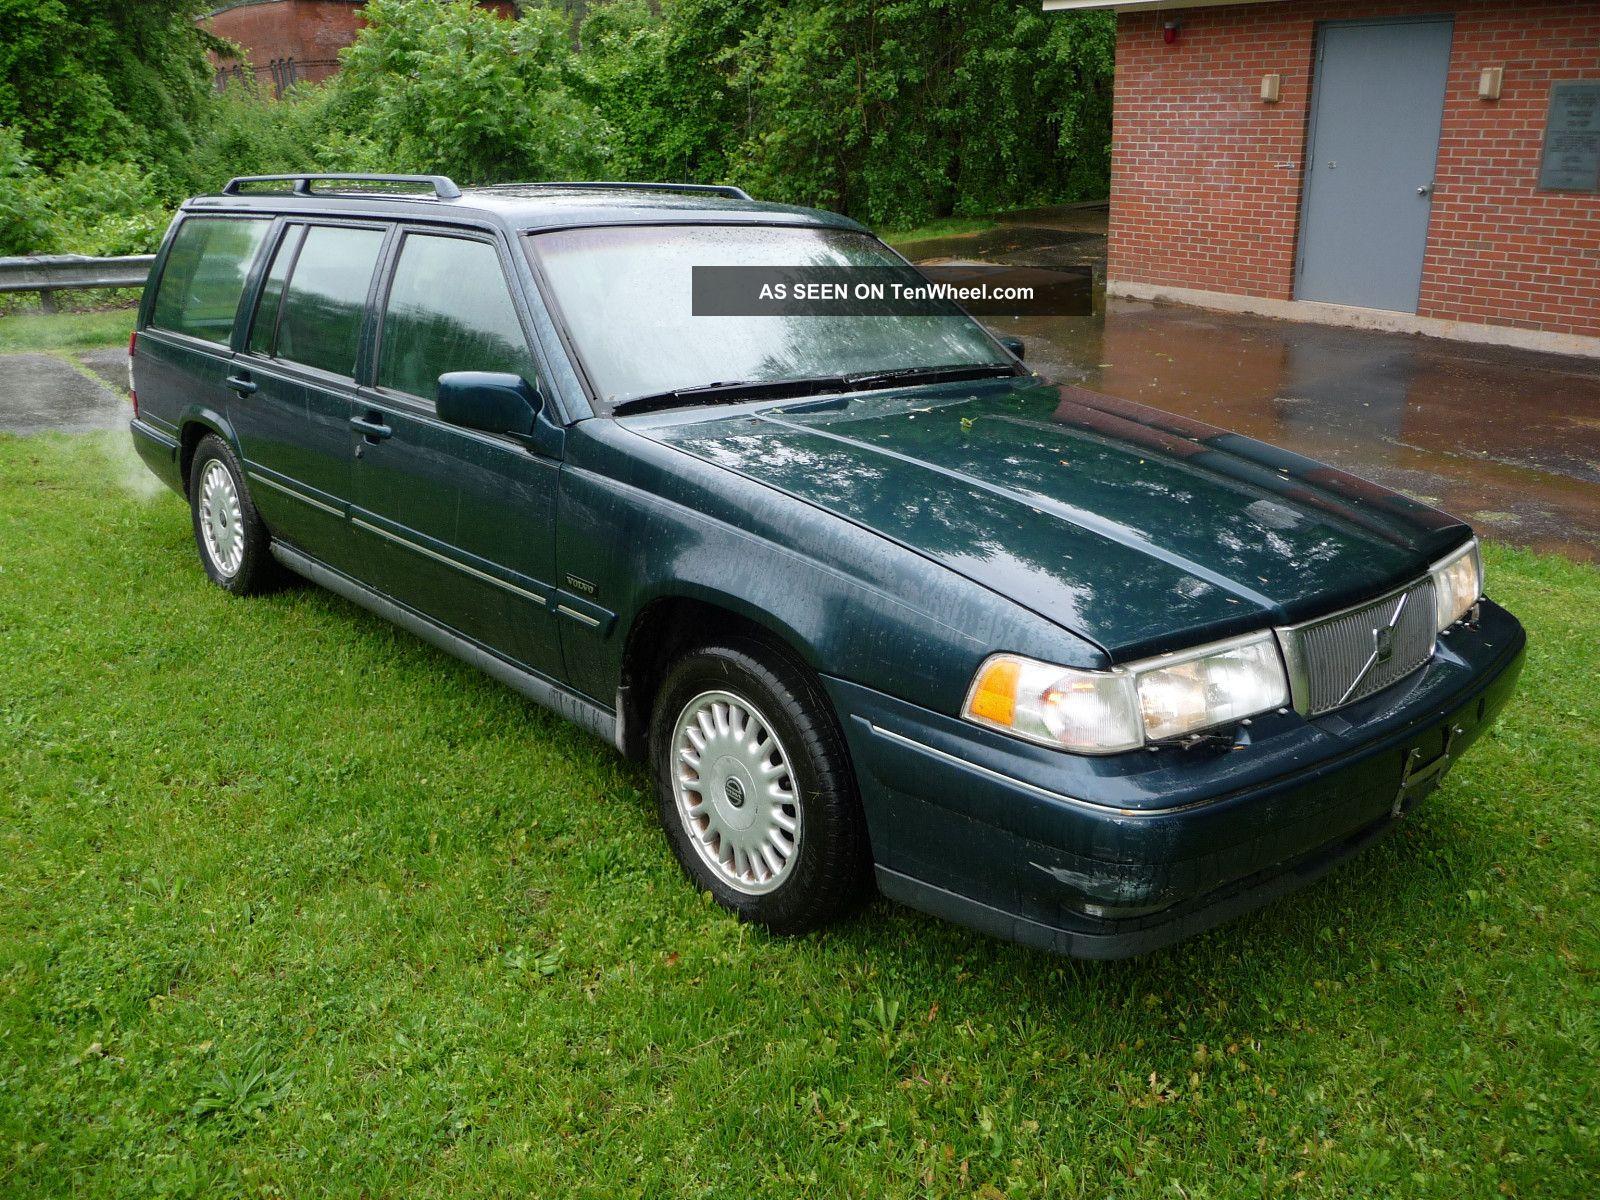 1997 Volvo 960 Wagon Rust Southern Wagon Other photo